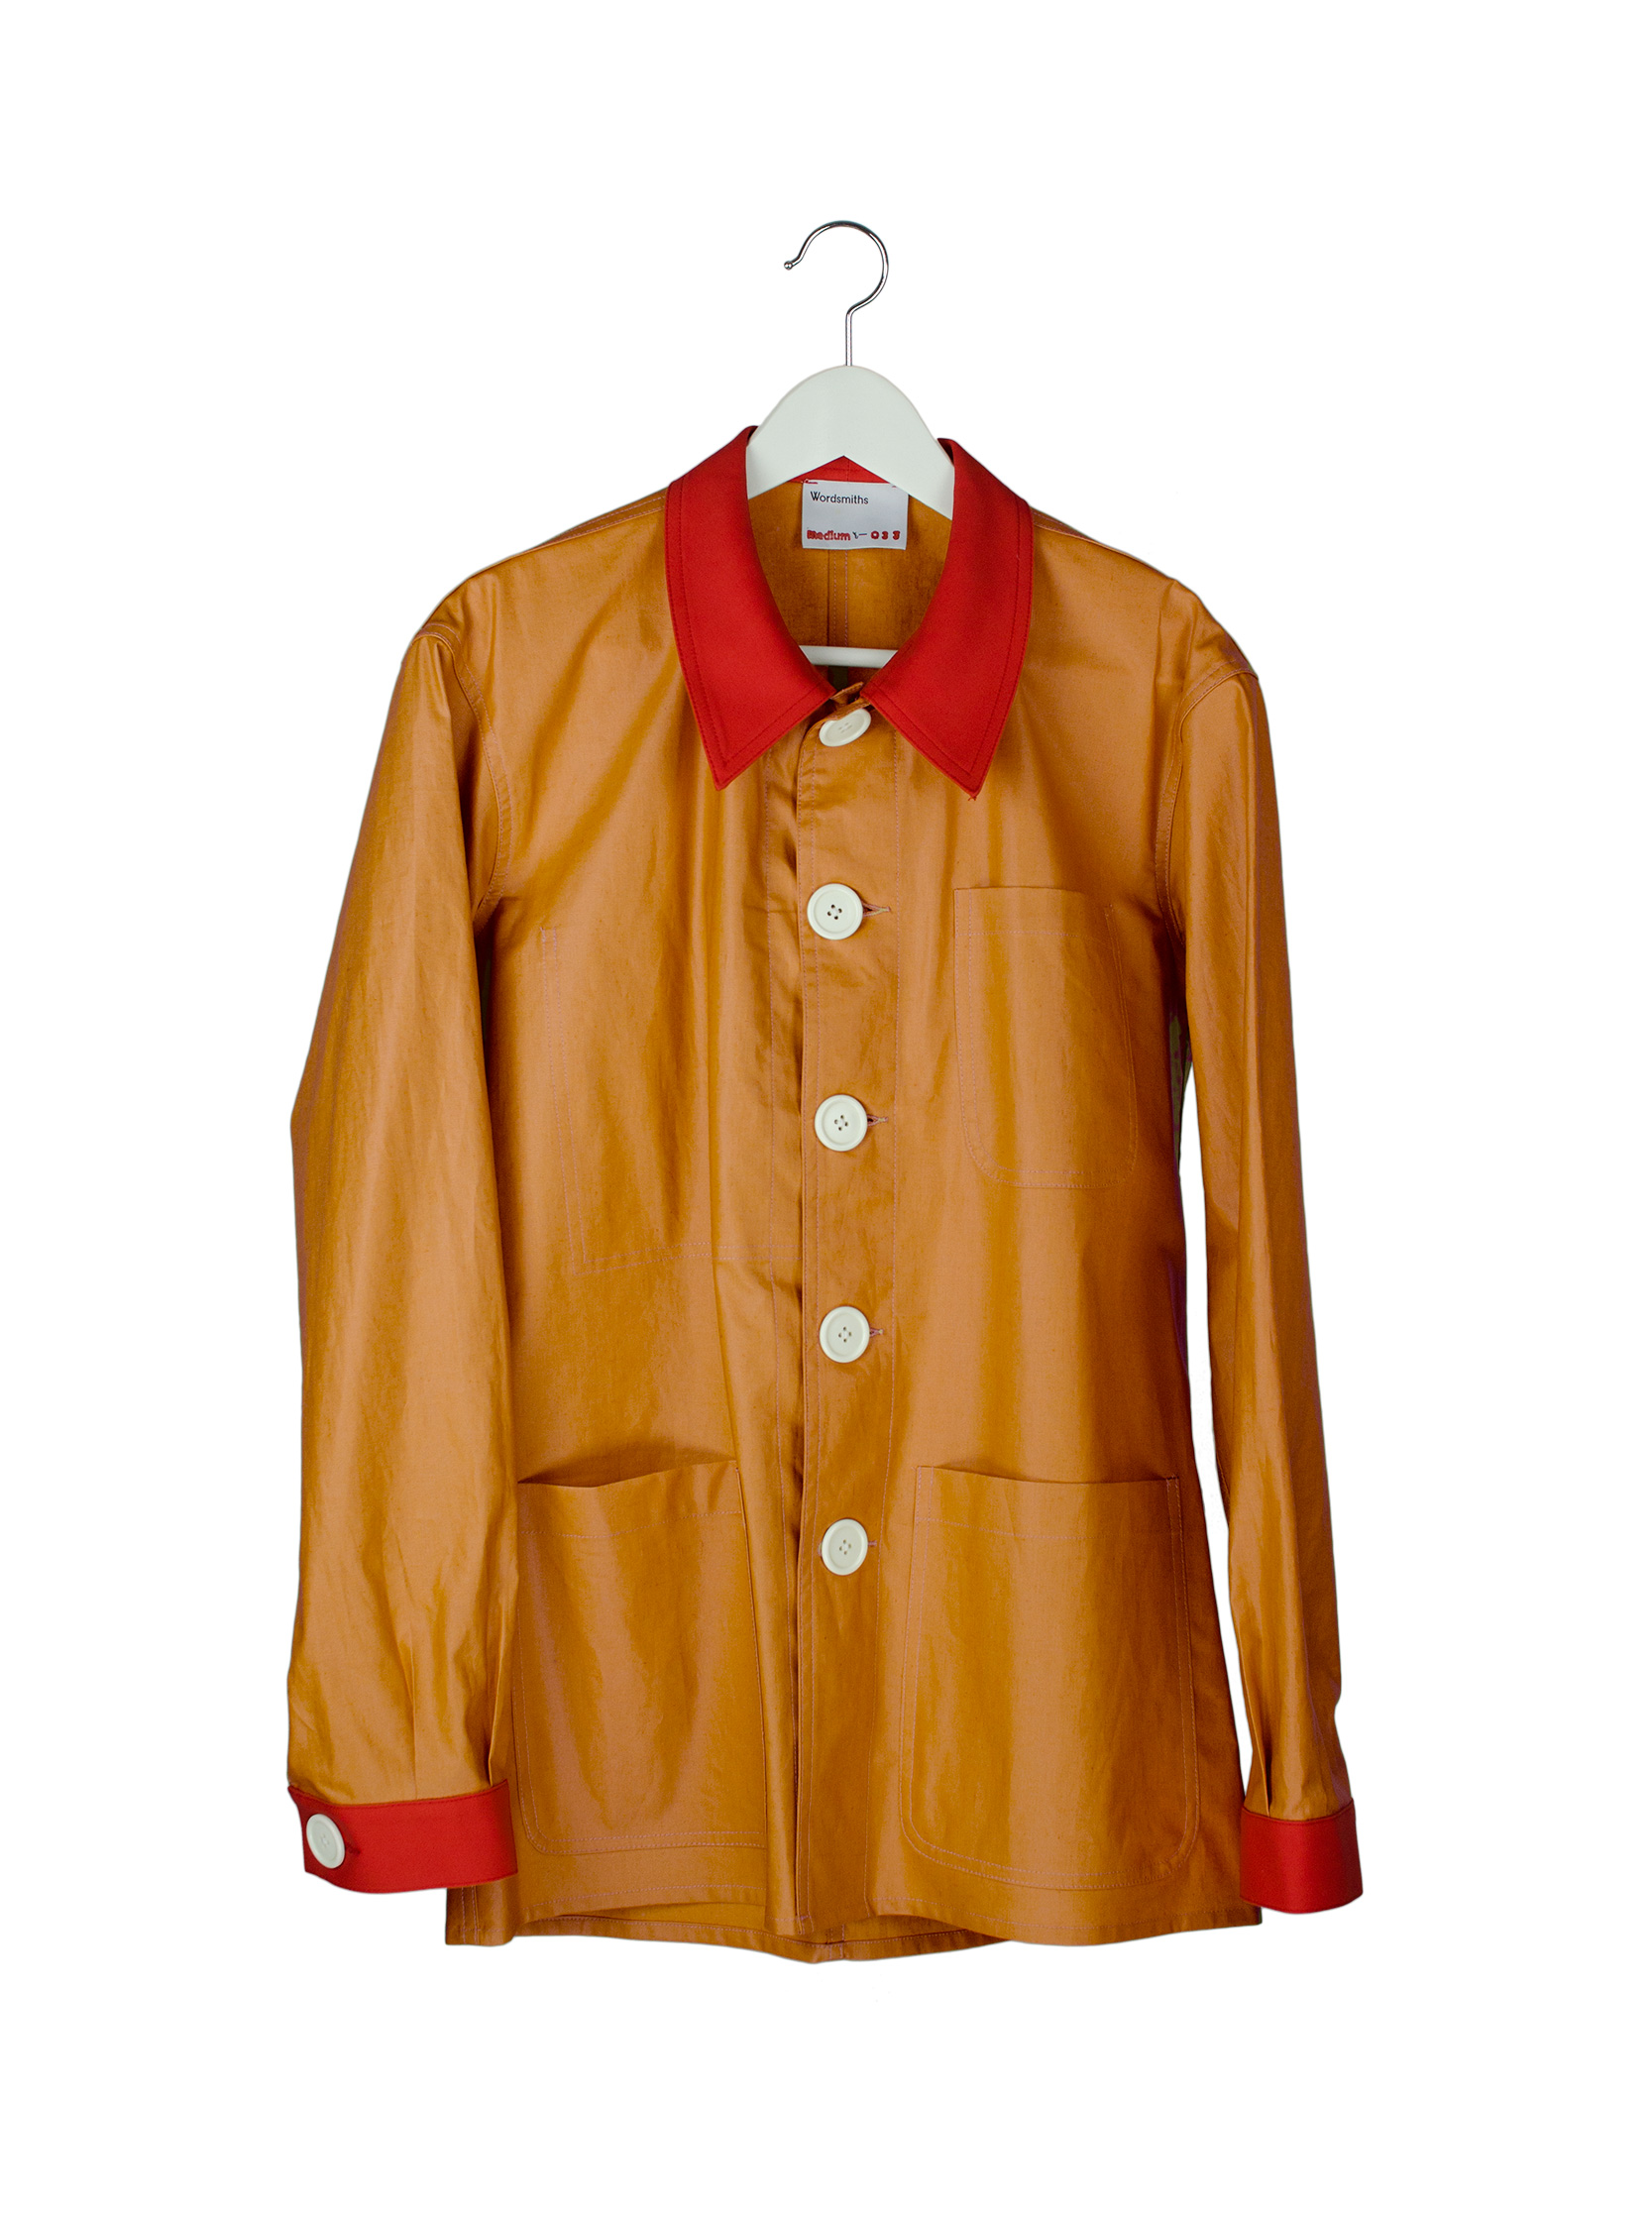 jacket-F-cc.jpg